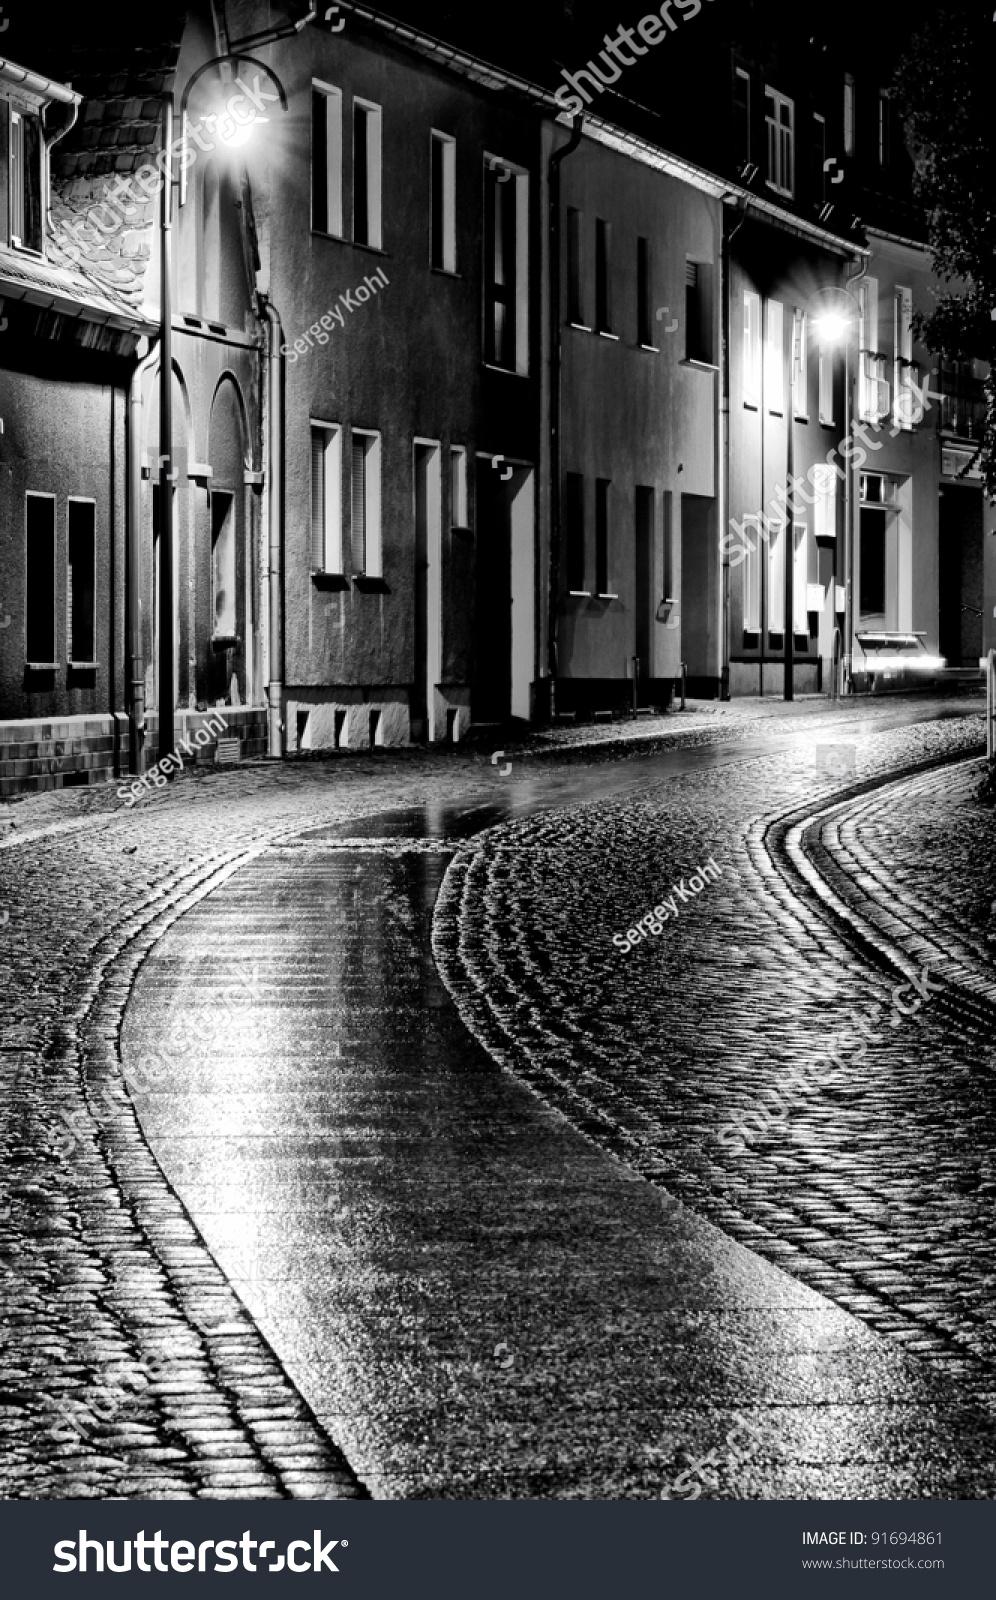 City Streets Old City Black White Stock Photo 91694861 ...